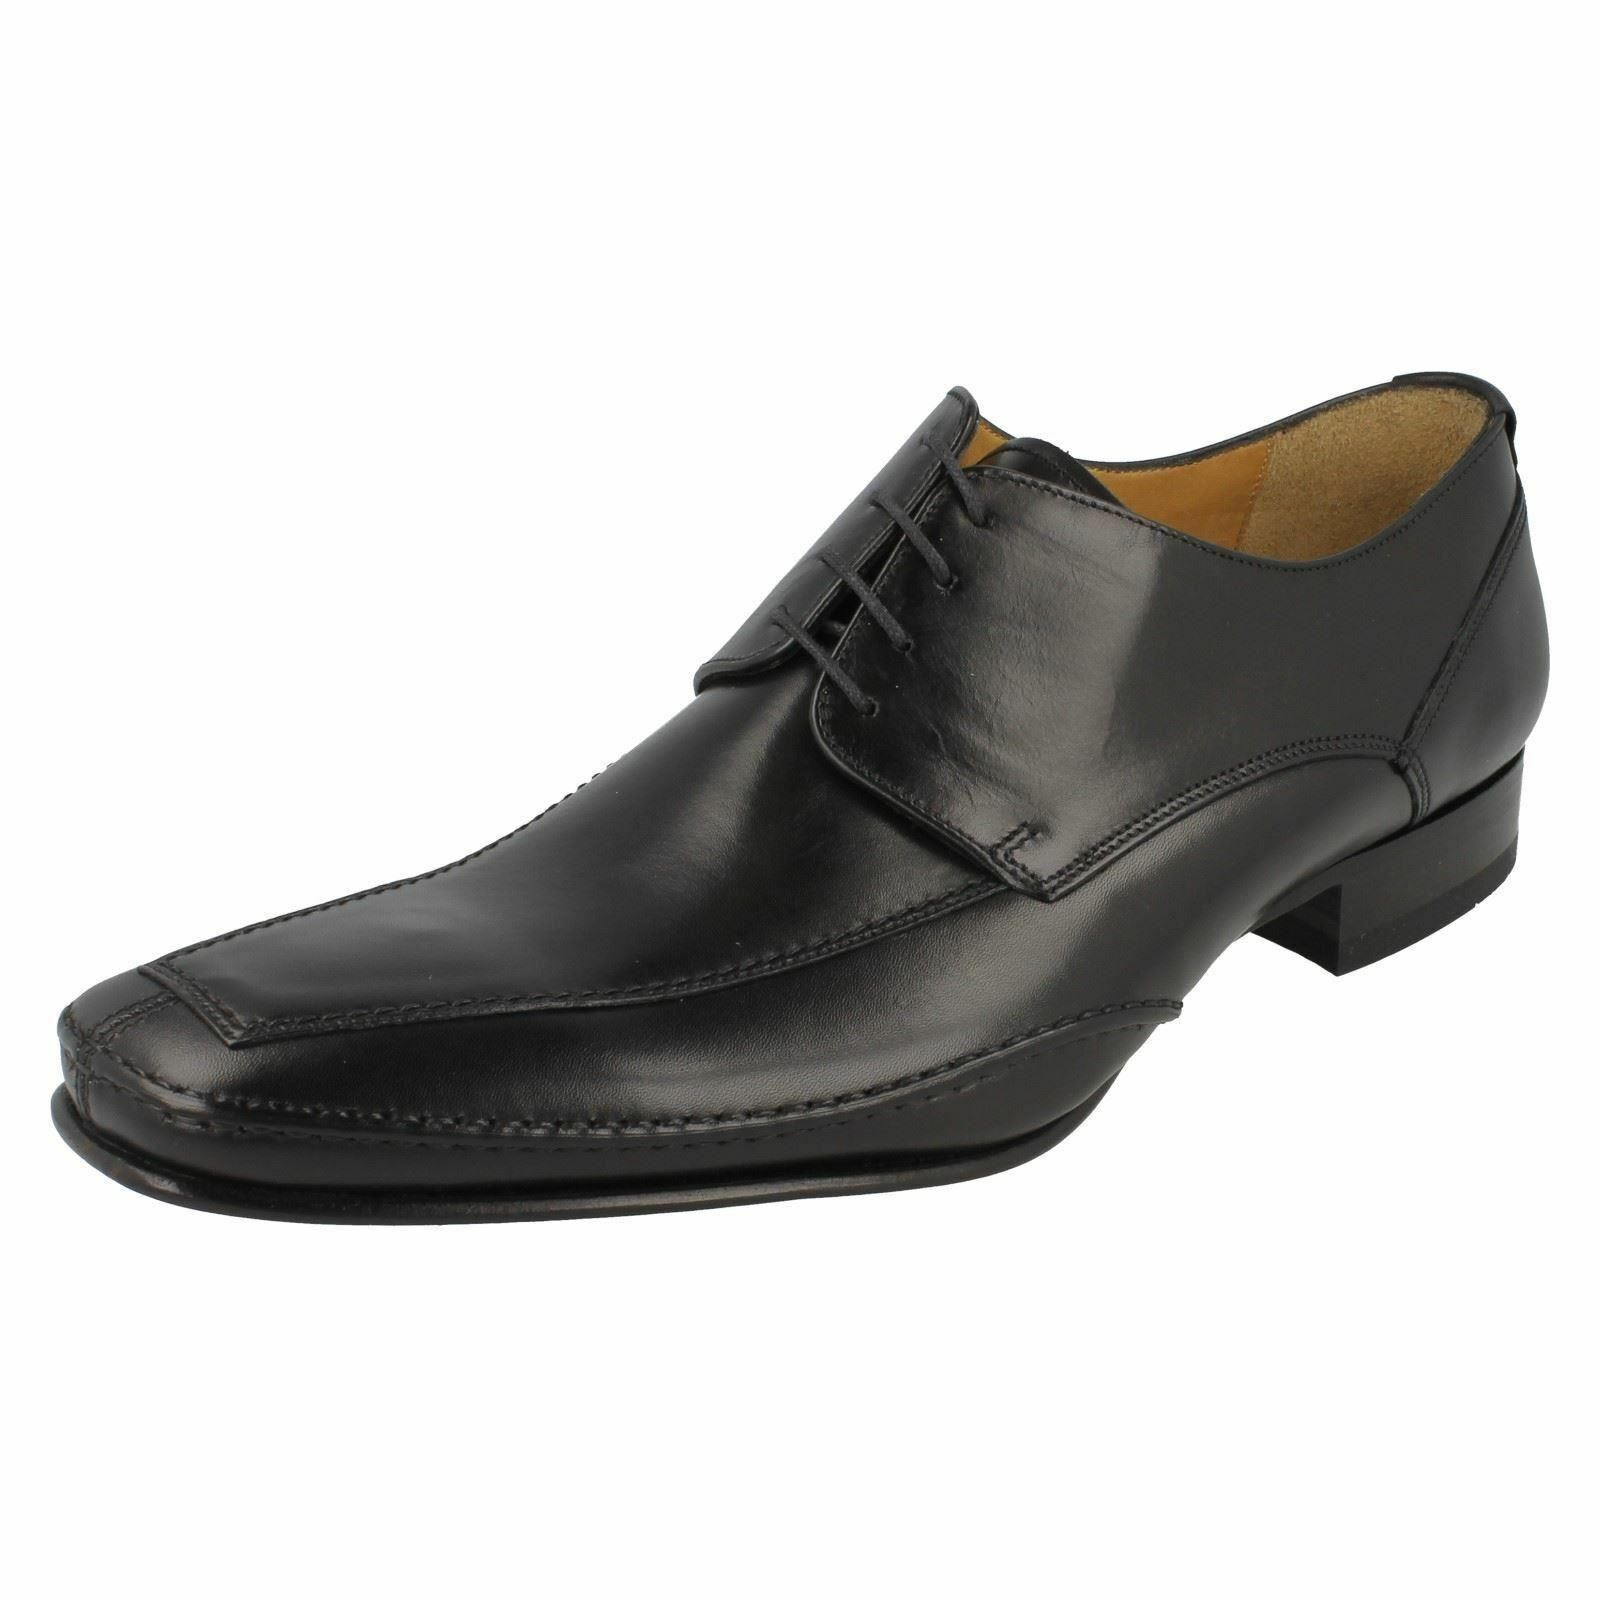 Design Loake Hurst Black Leather Smart Lace Up Shoes